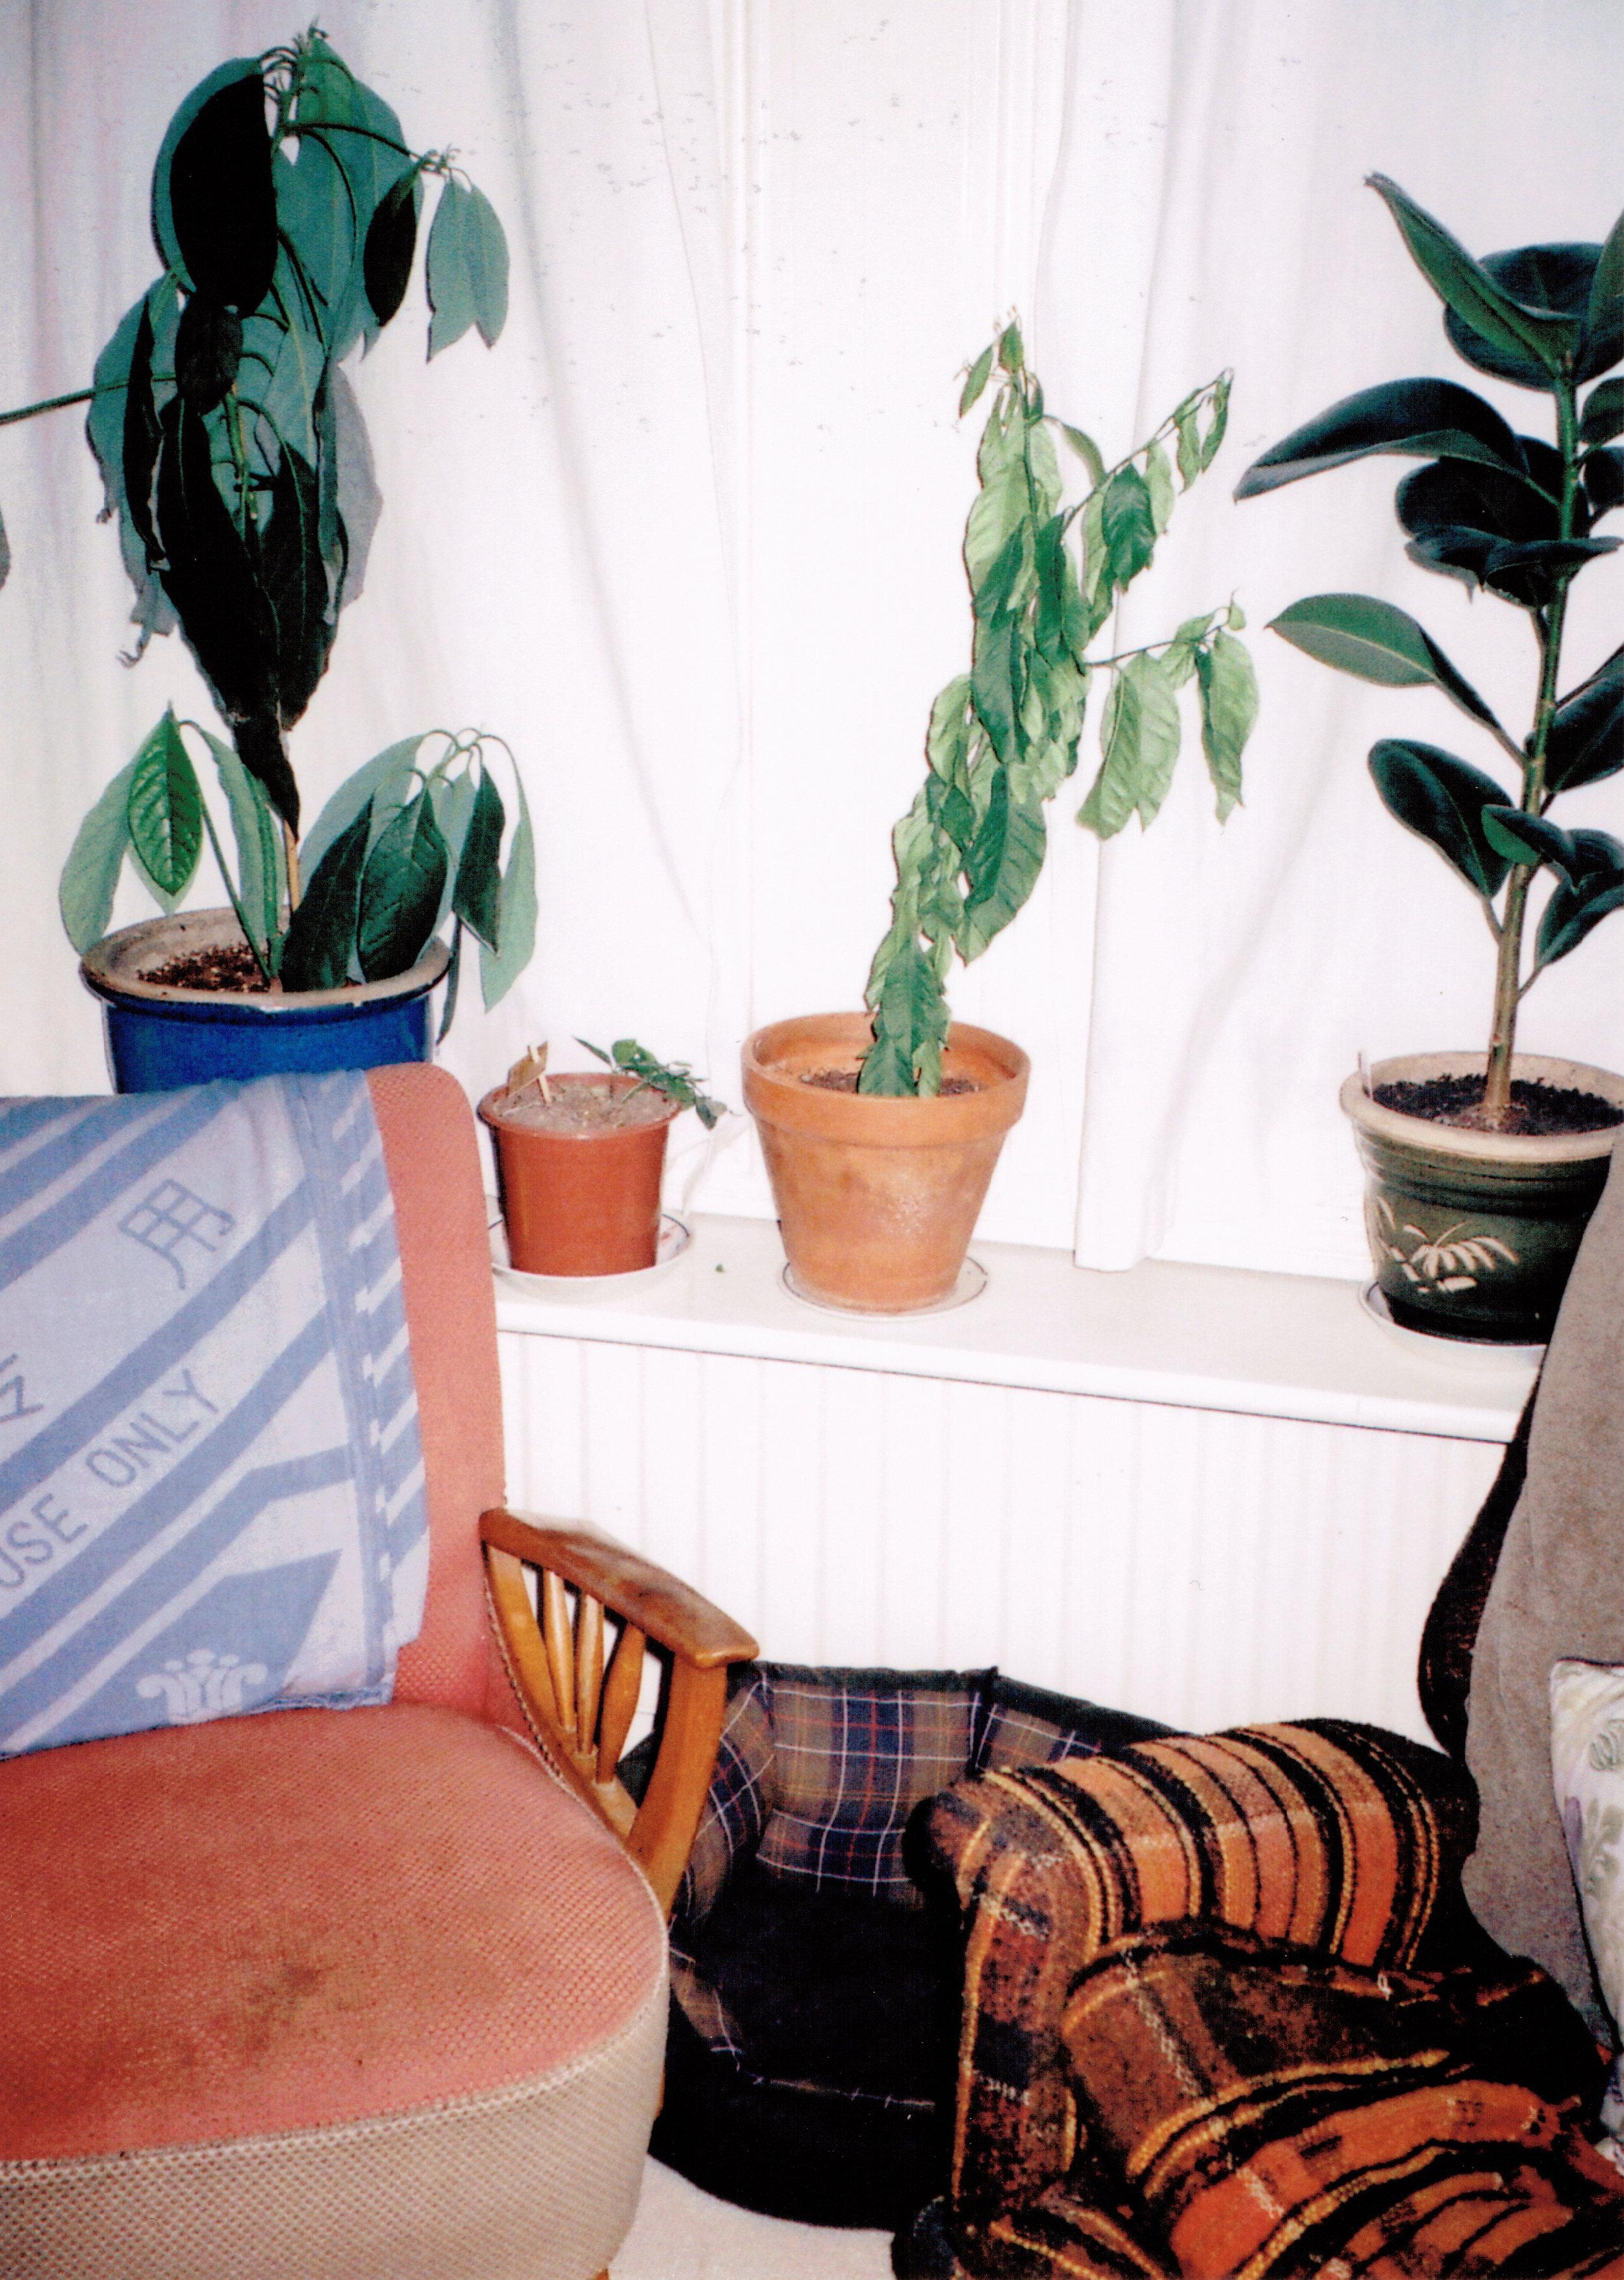 Jordan's flat in Streatham